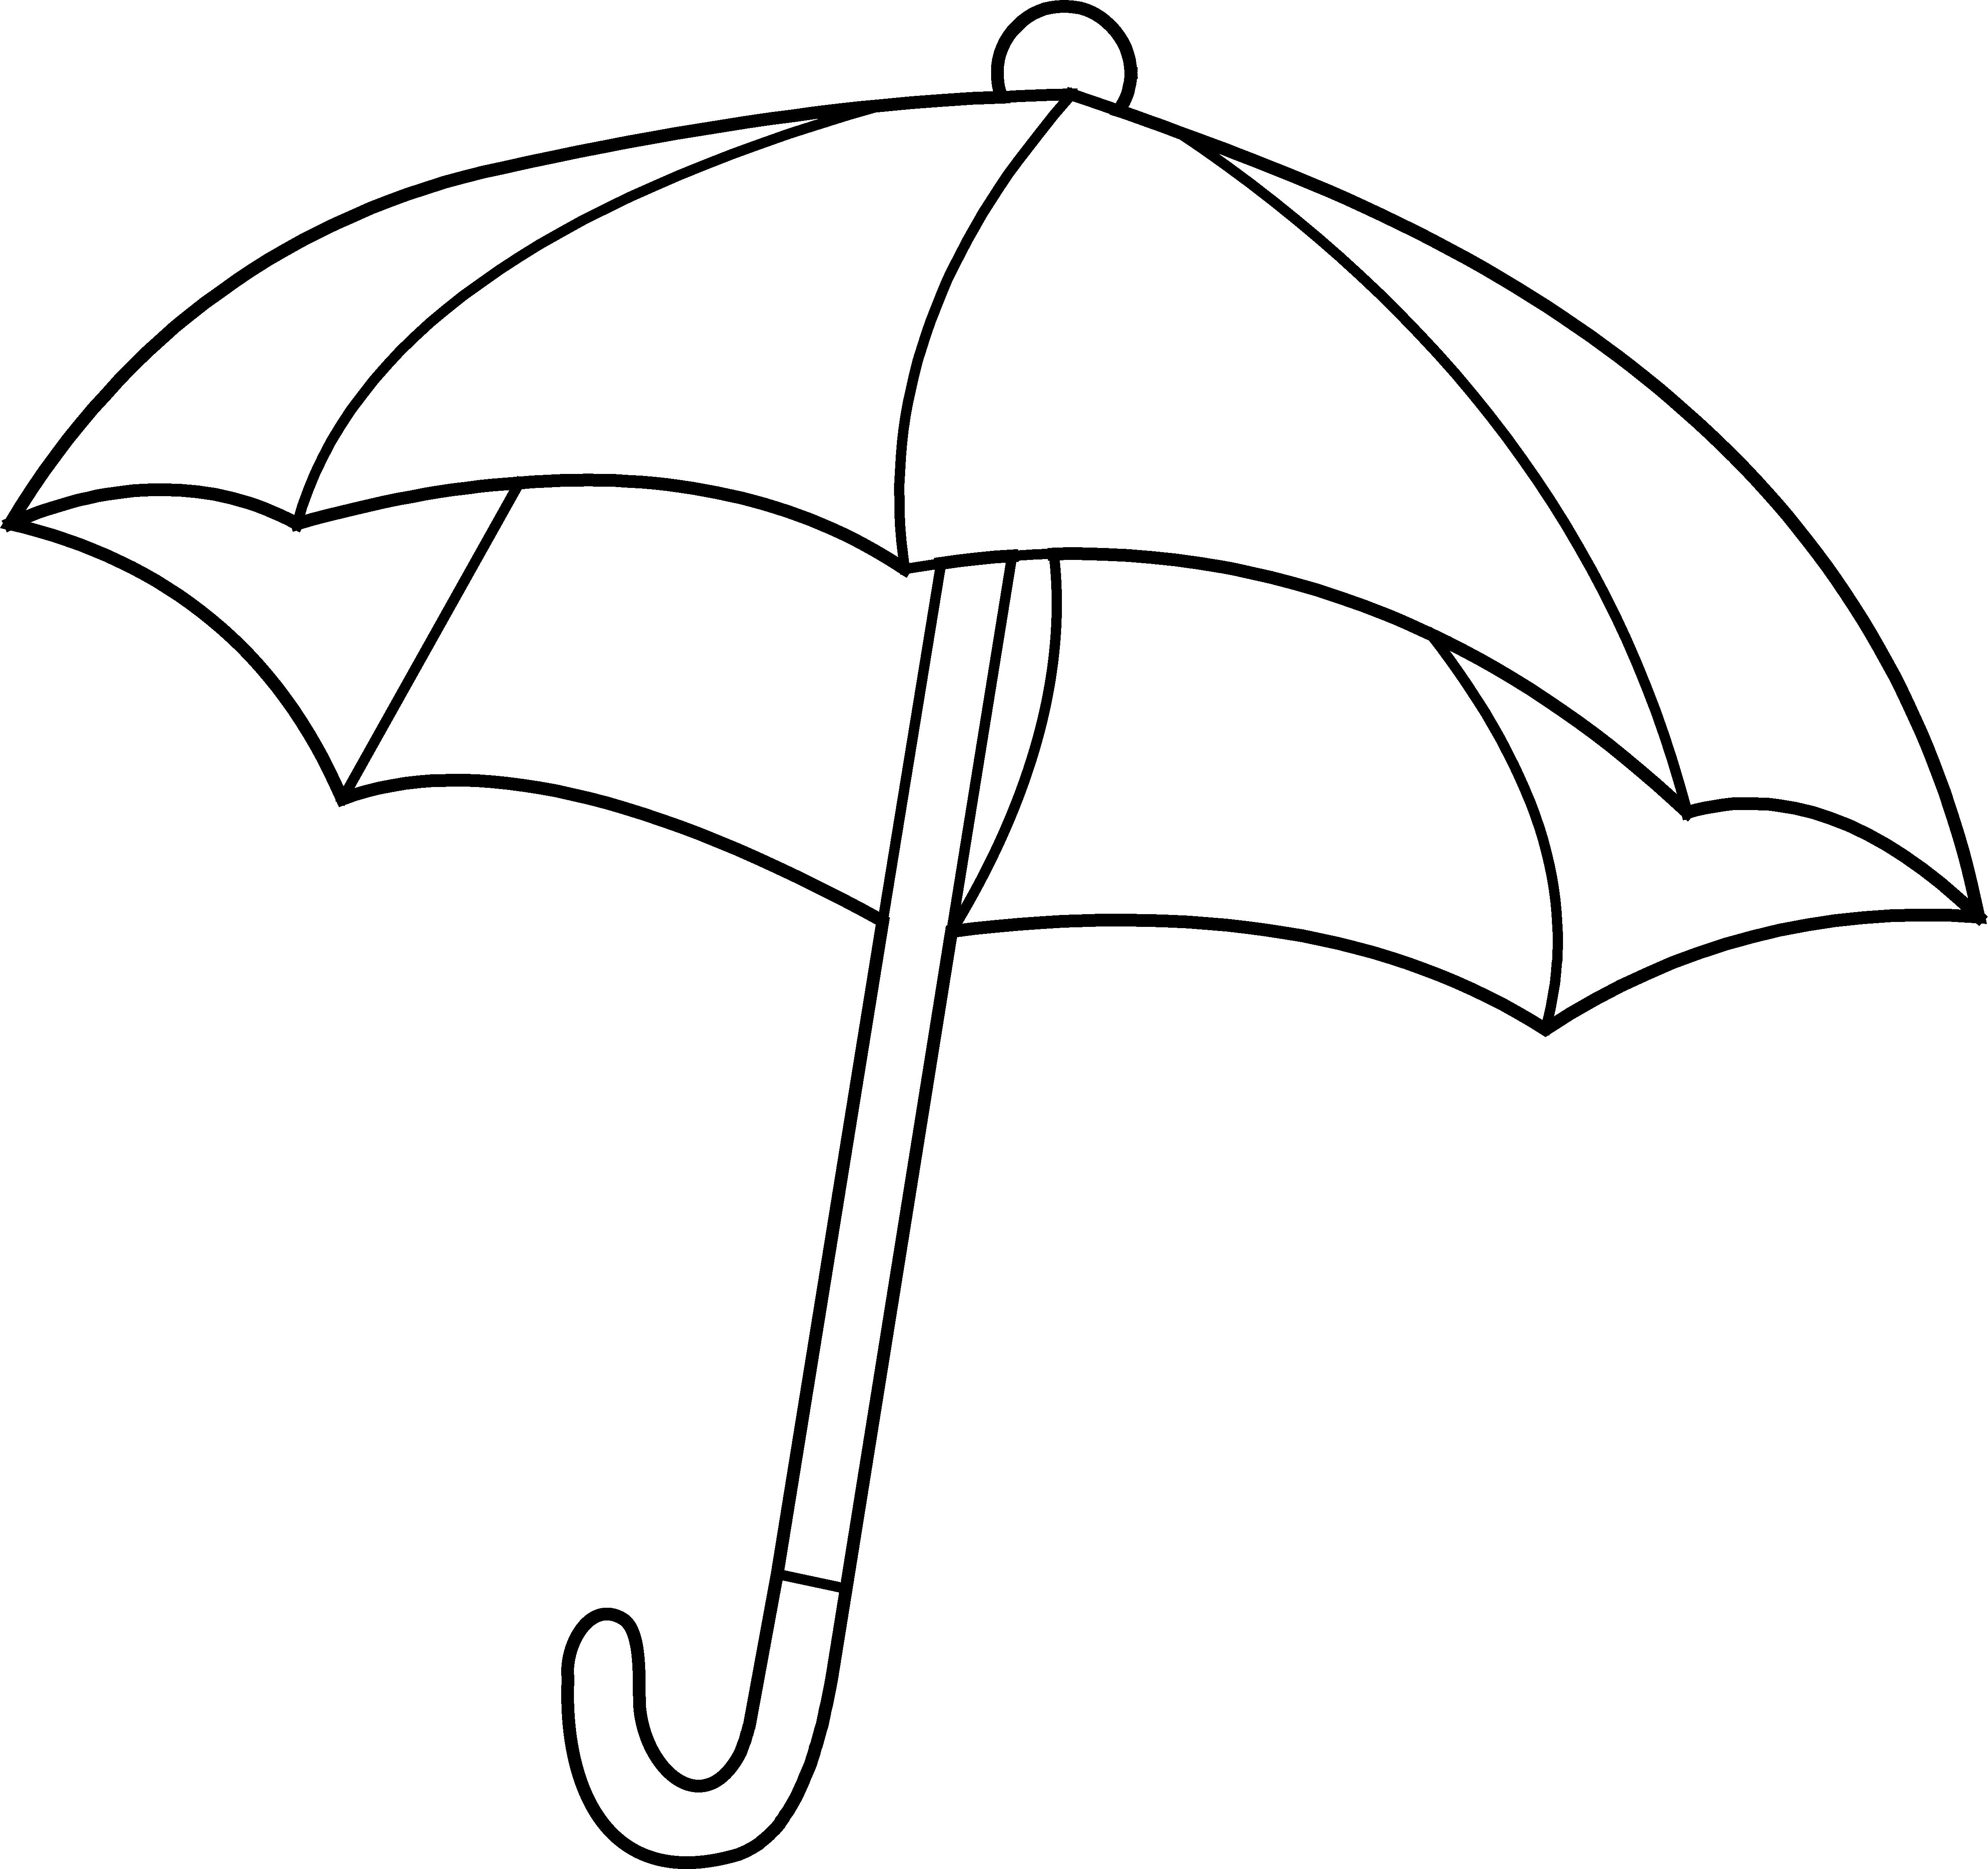 collection of white. Clipart umbrella umbrellablack